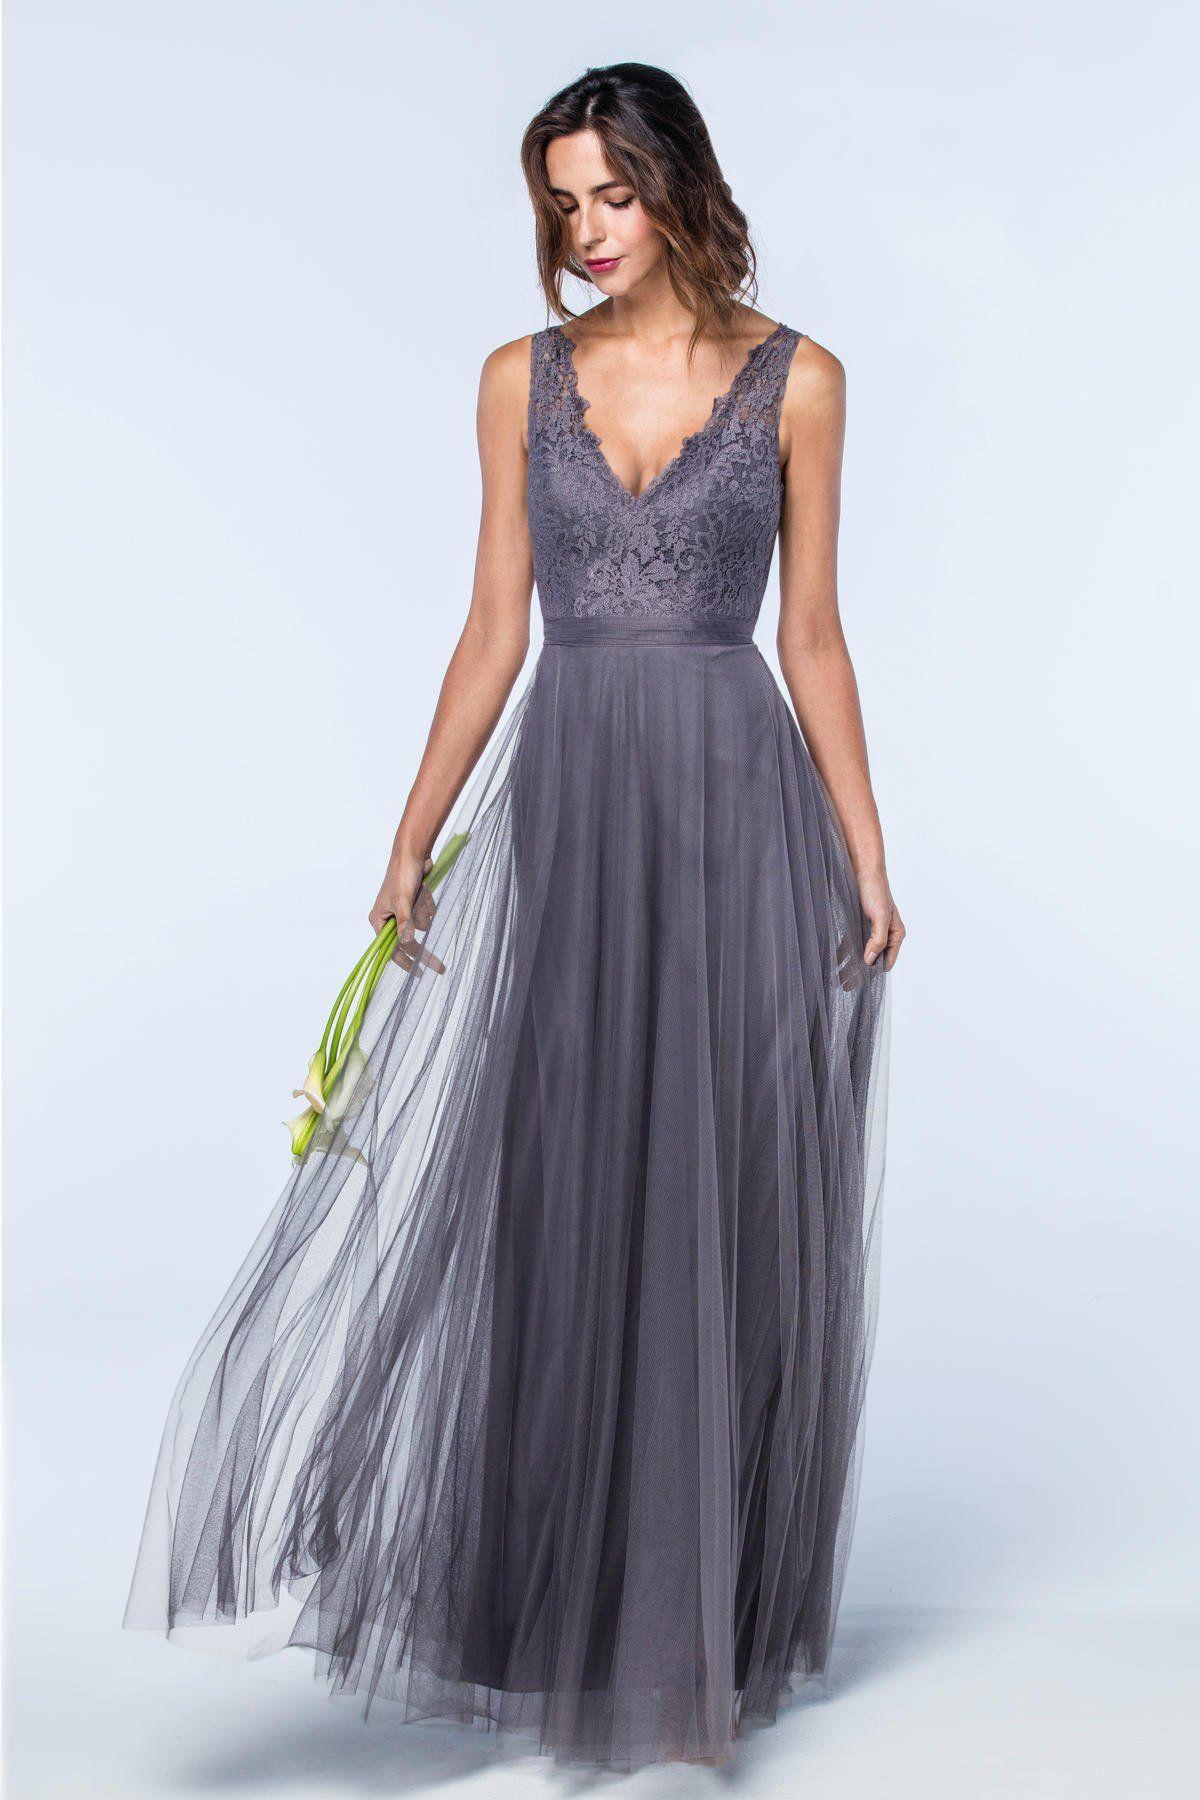 Desiree 2600 | Bridesmaids | Watters Pewter | Bridesmaid Inspo ...